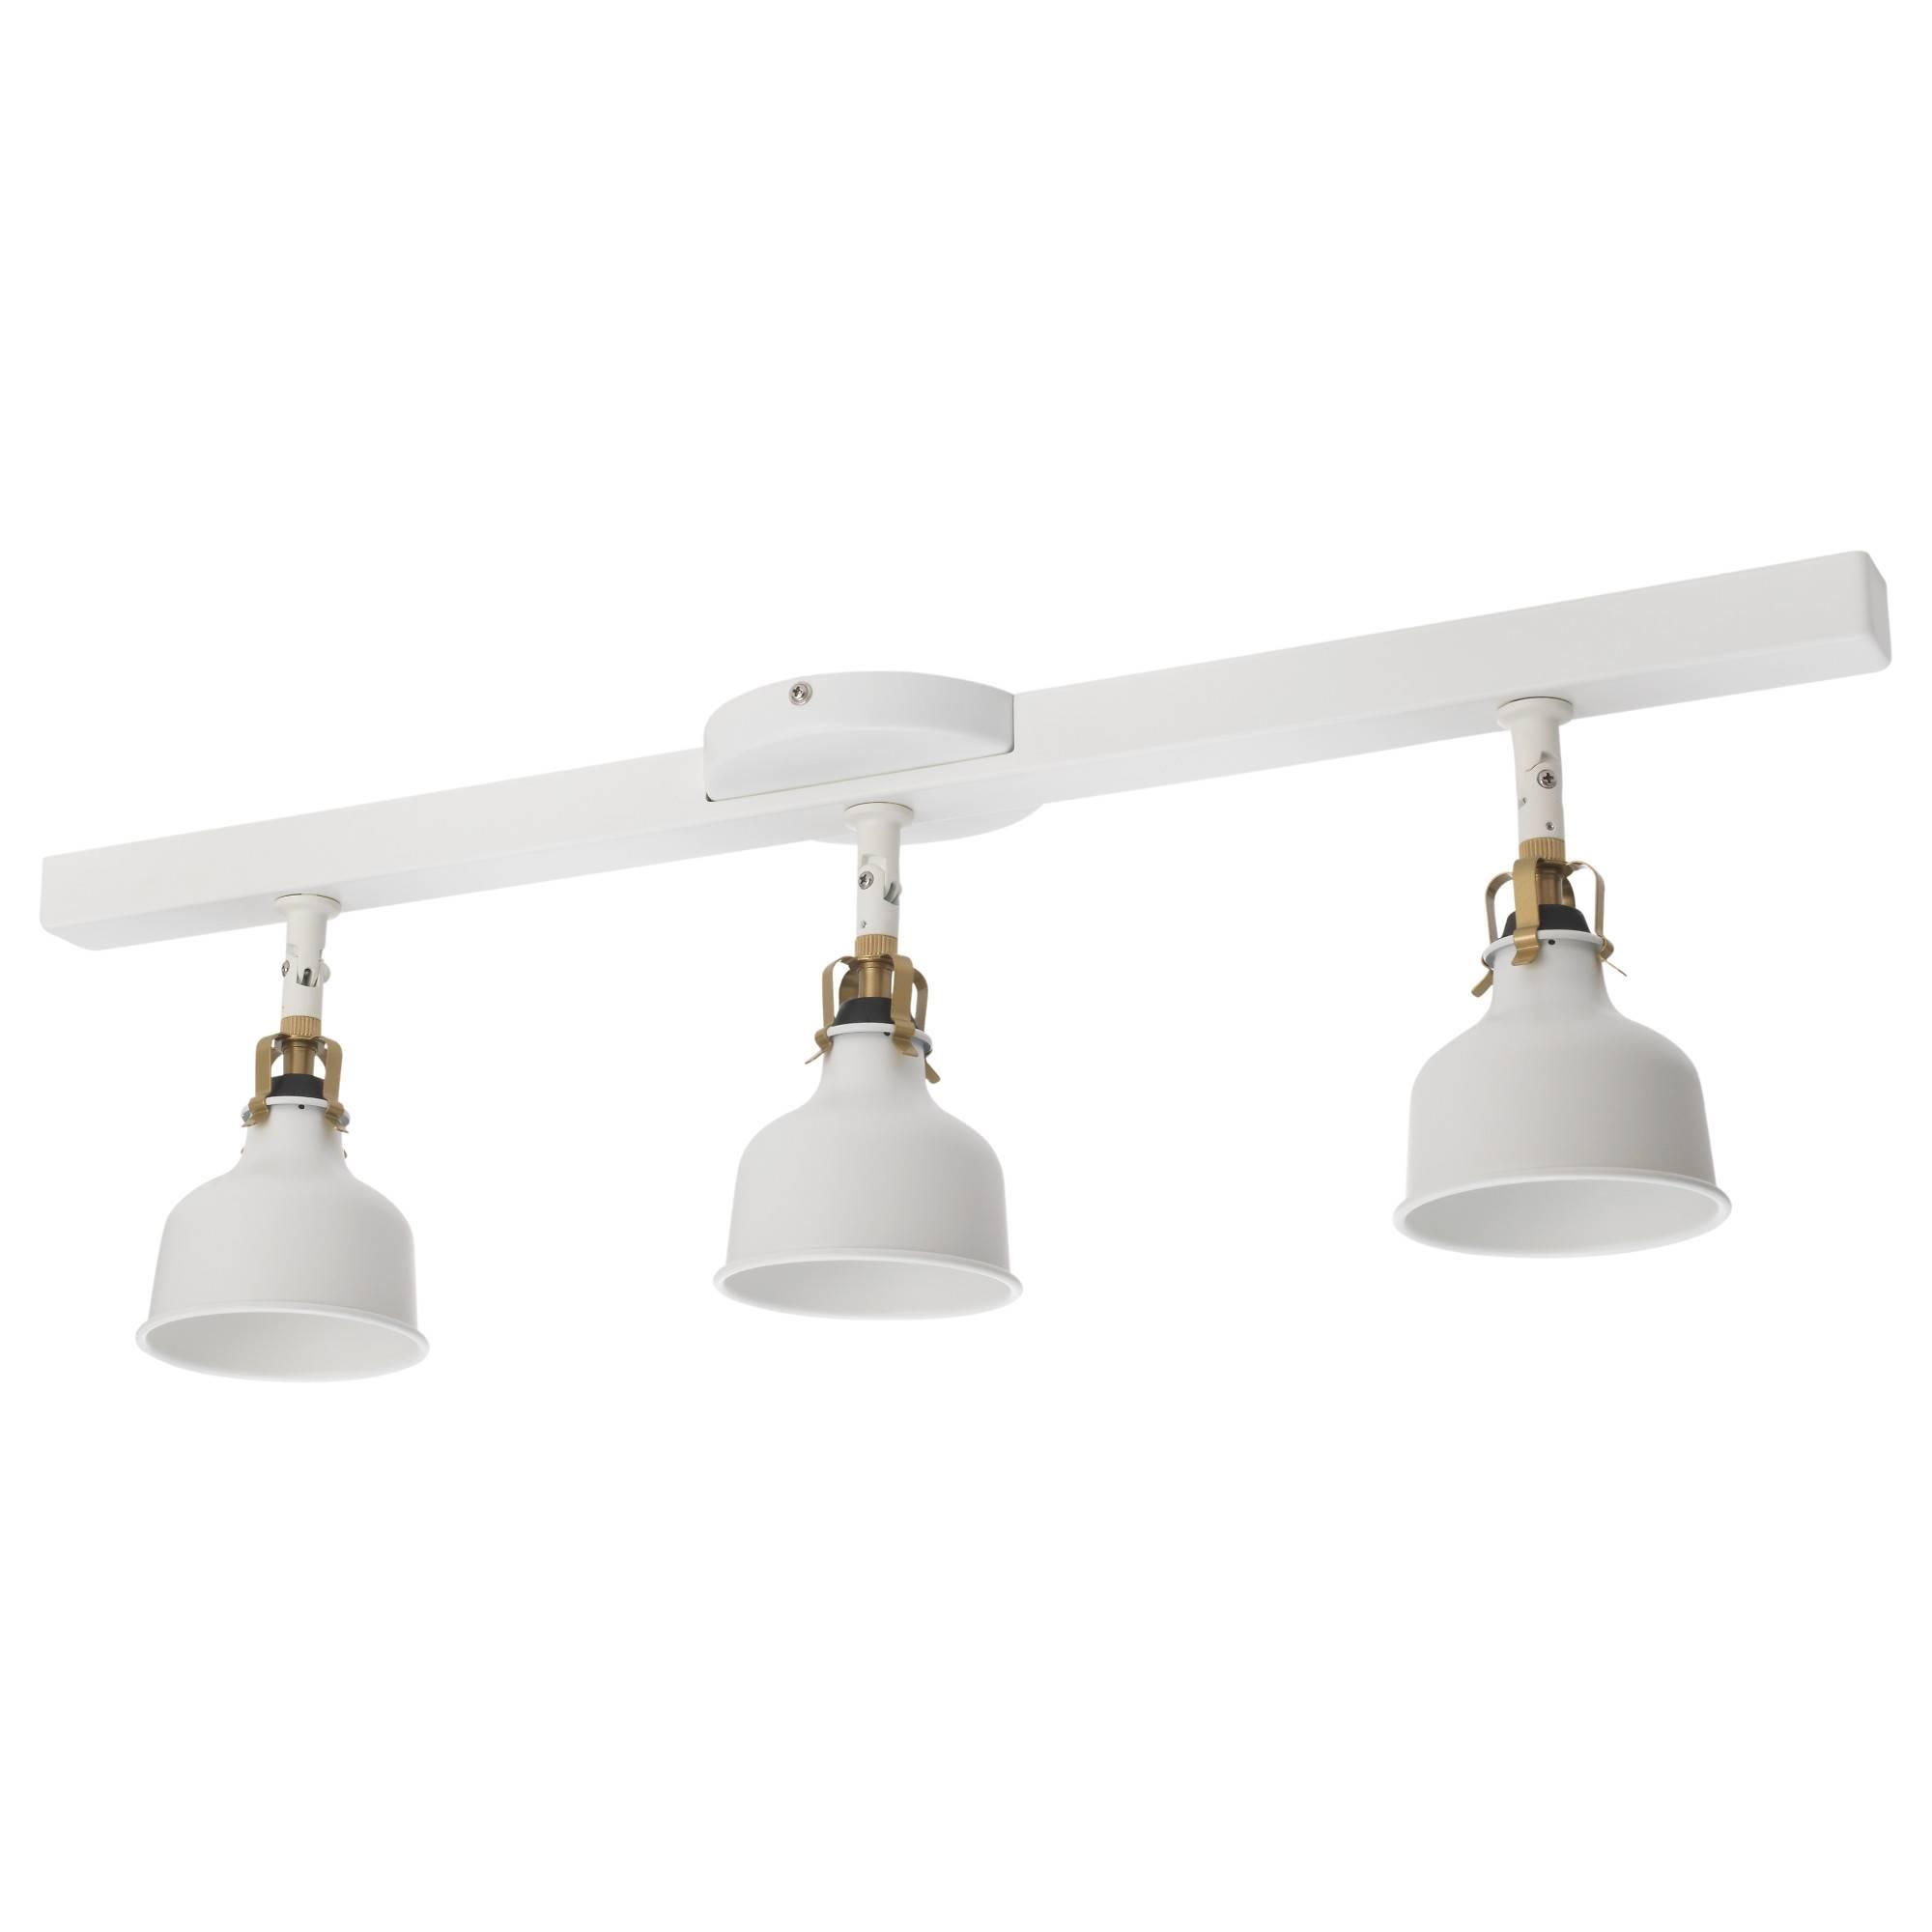 Lovely Track Lighting Standards 32 For Your Light In The Box Order regarding Lights In The Box Lighting (Image 9 of 12)